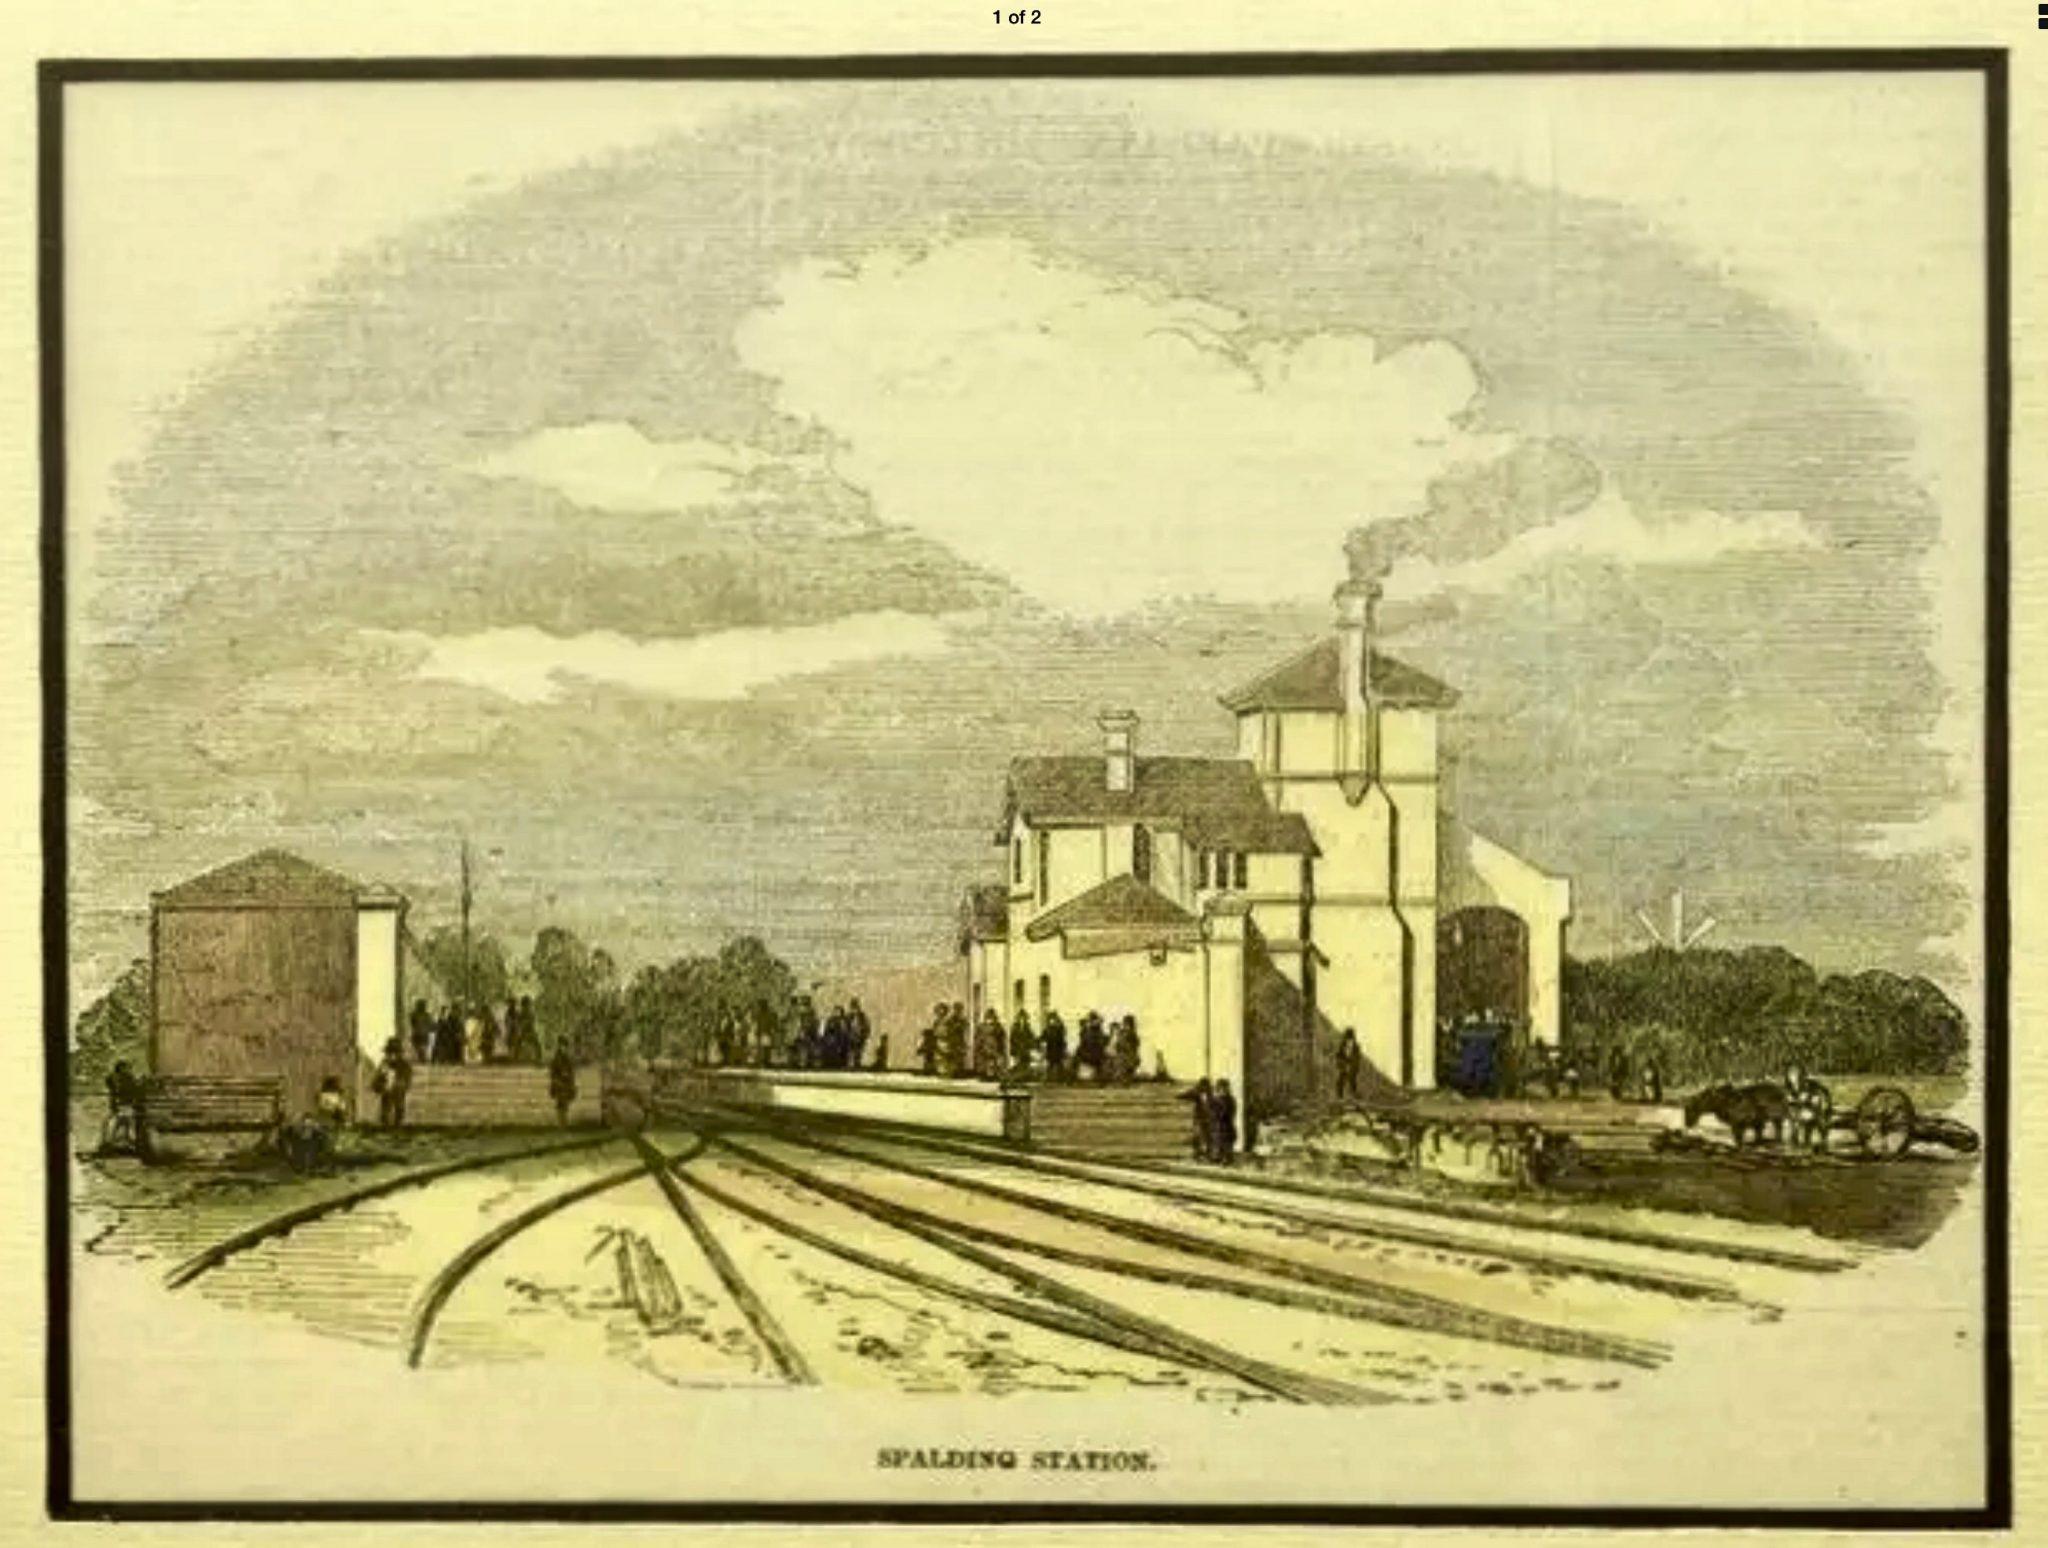 Spalding Railway Station